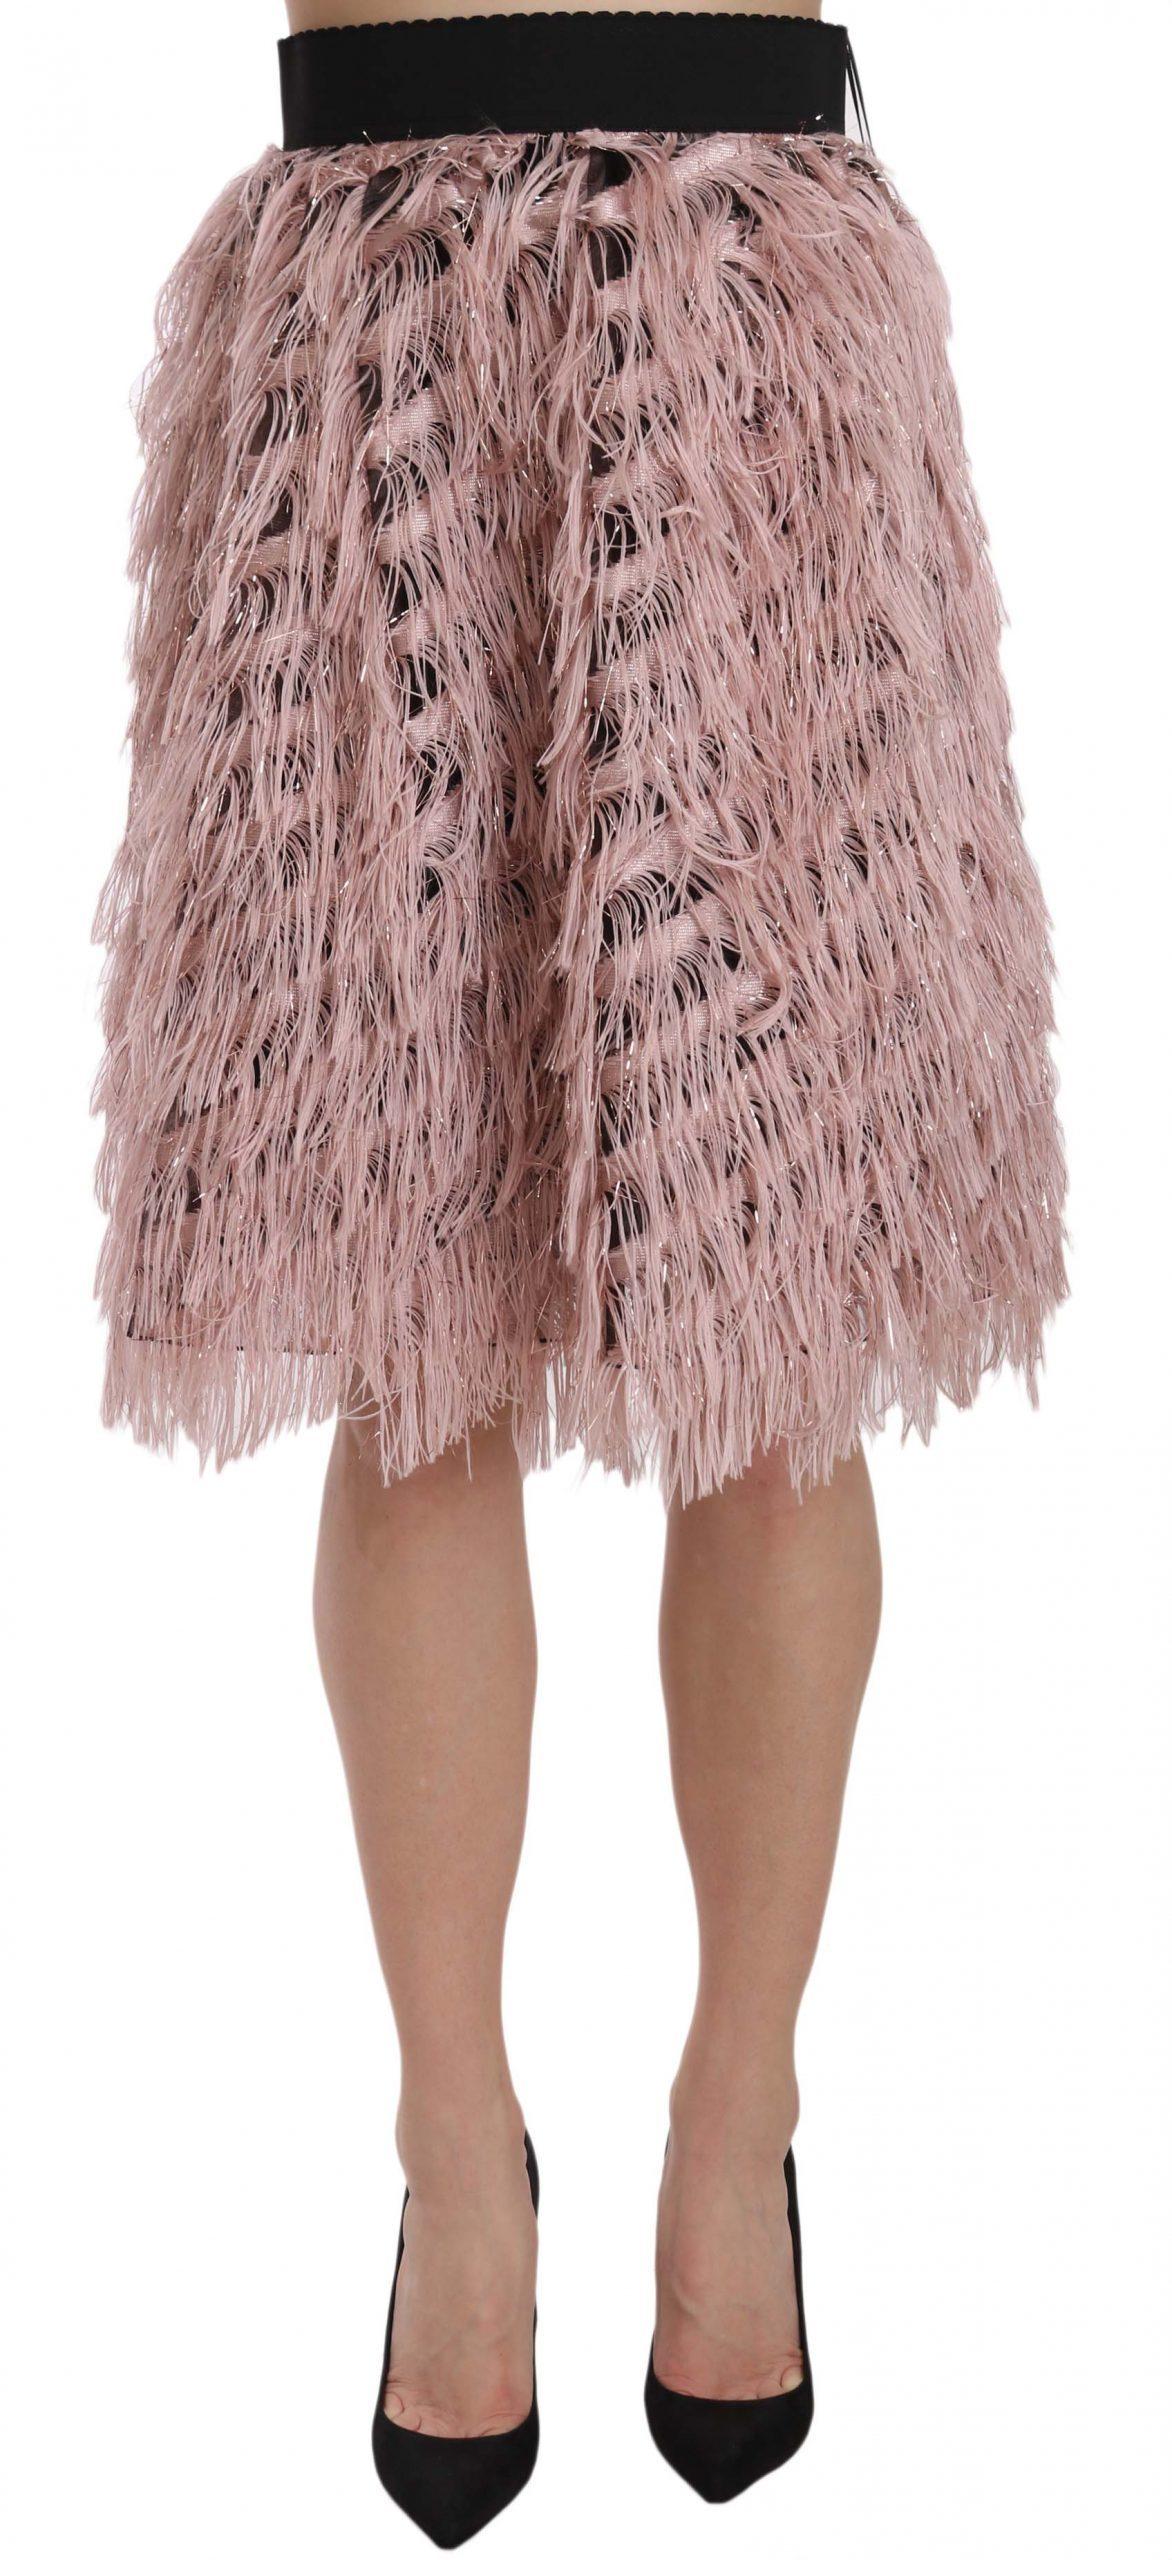 Dolce & Gabbana Women's Skirt Gold And Pink SKI1178 - IT38|XS